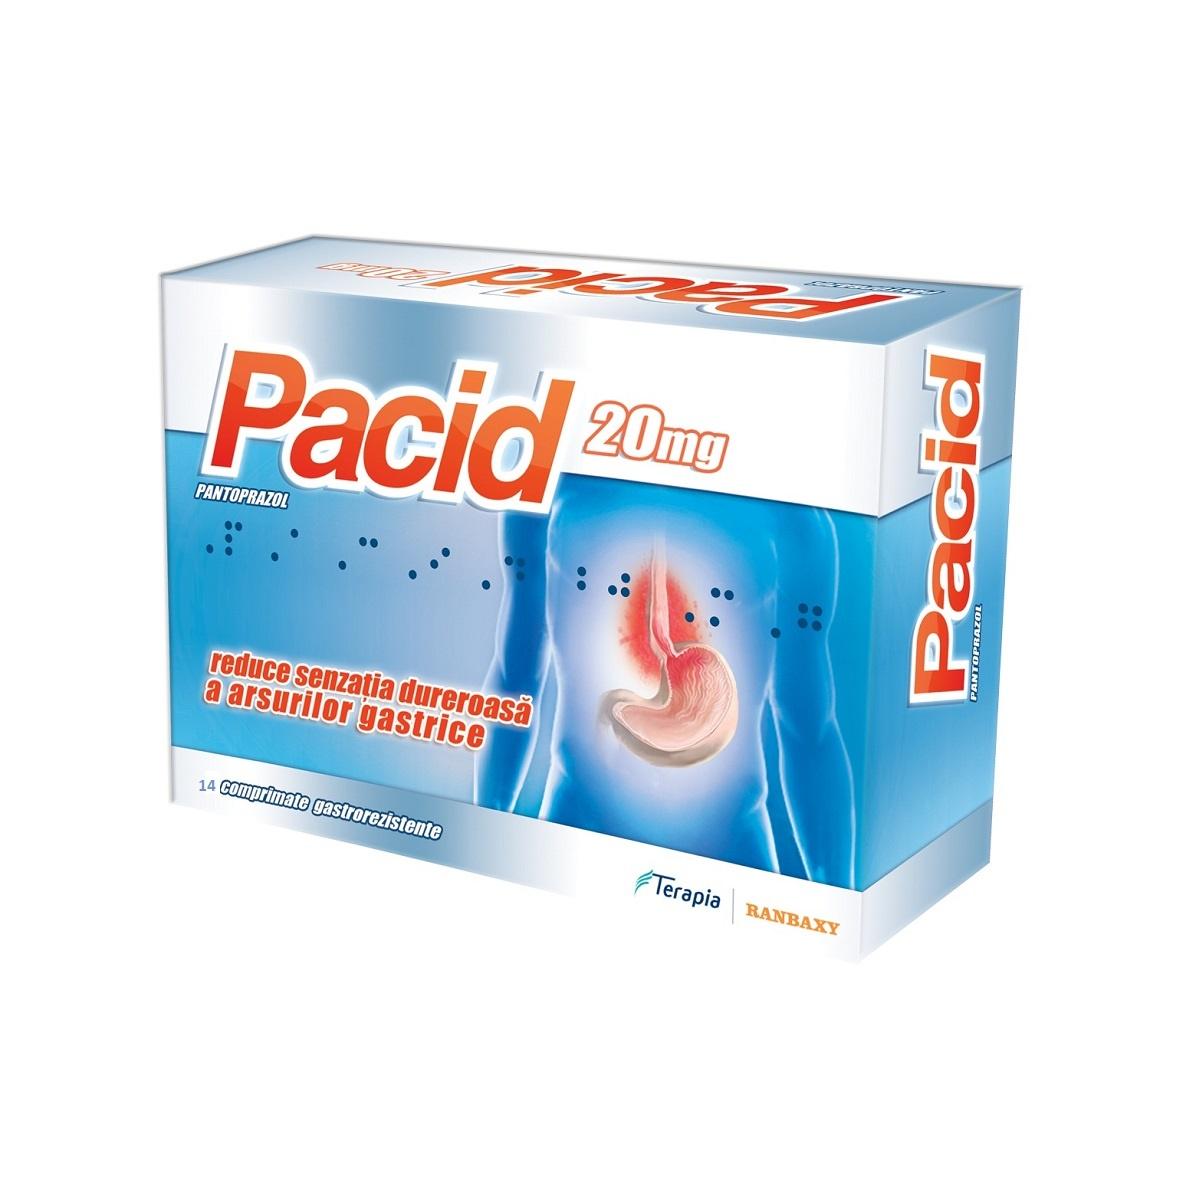 Pacid 20mg, 14 comprimate, Terapia